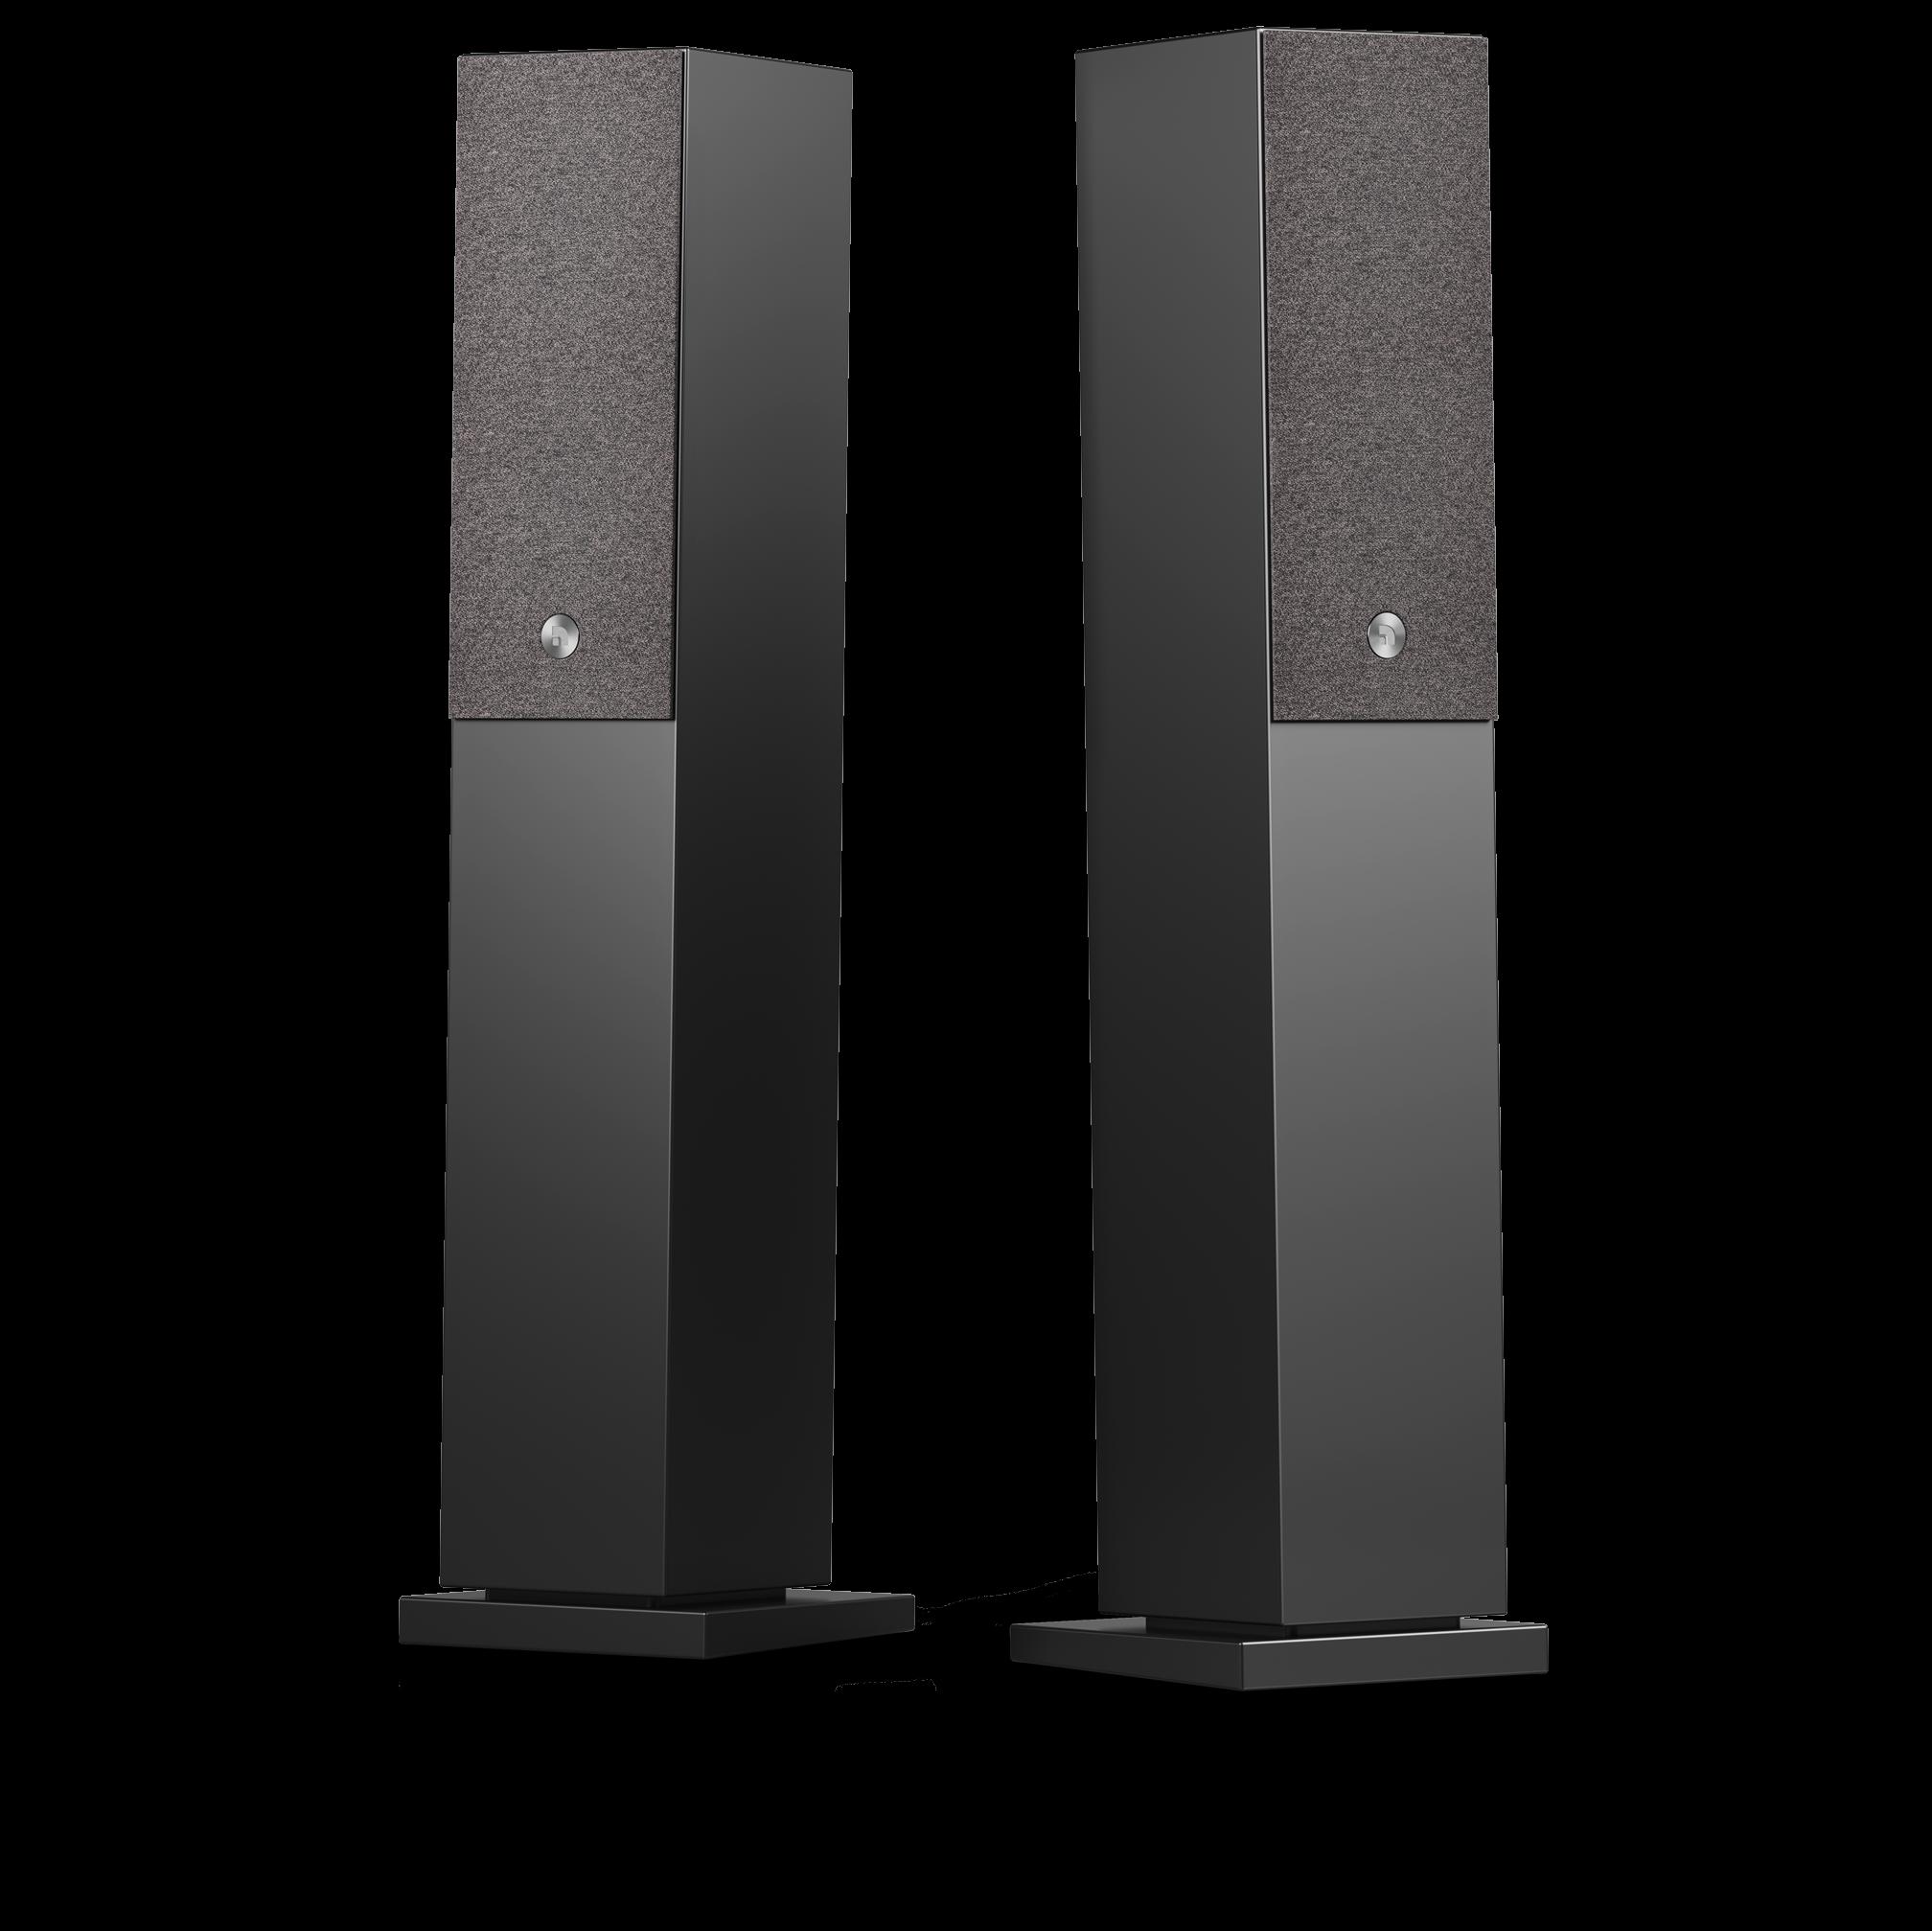 Audio Pro - A36 Ultimate TV sound - Black